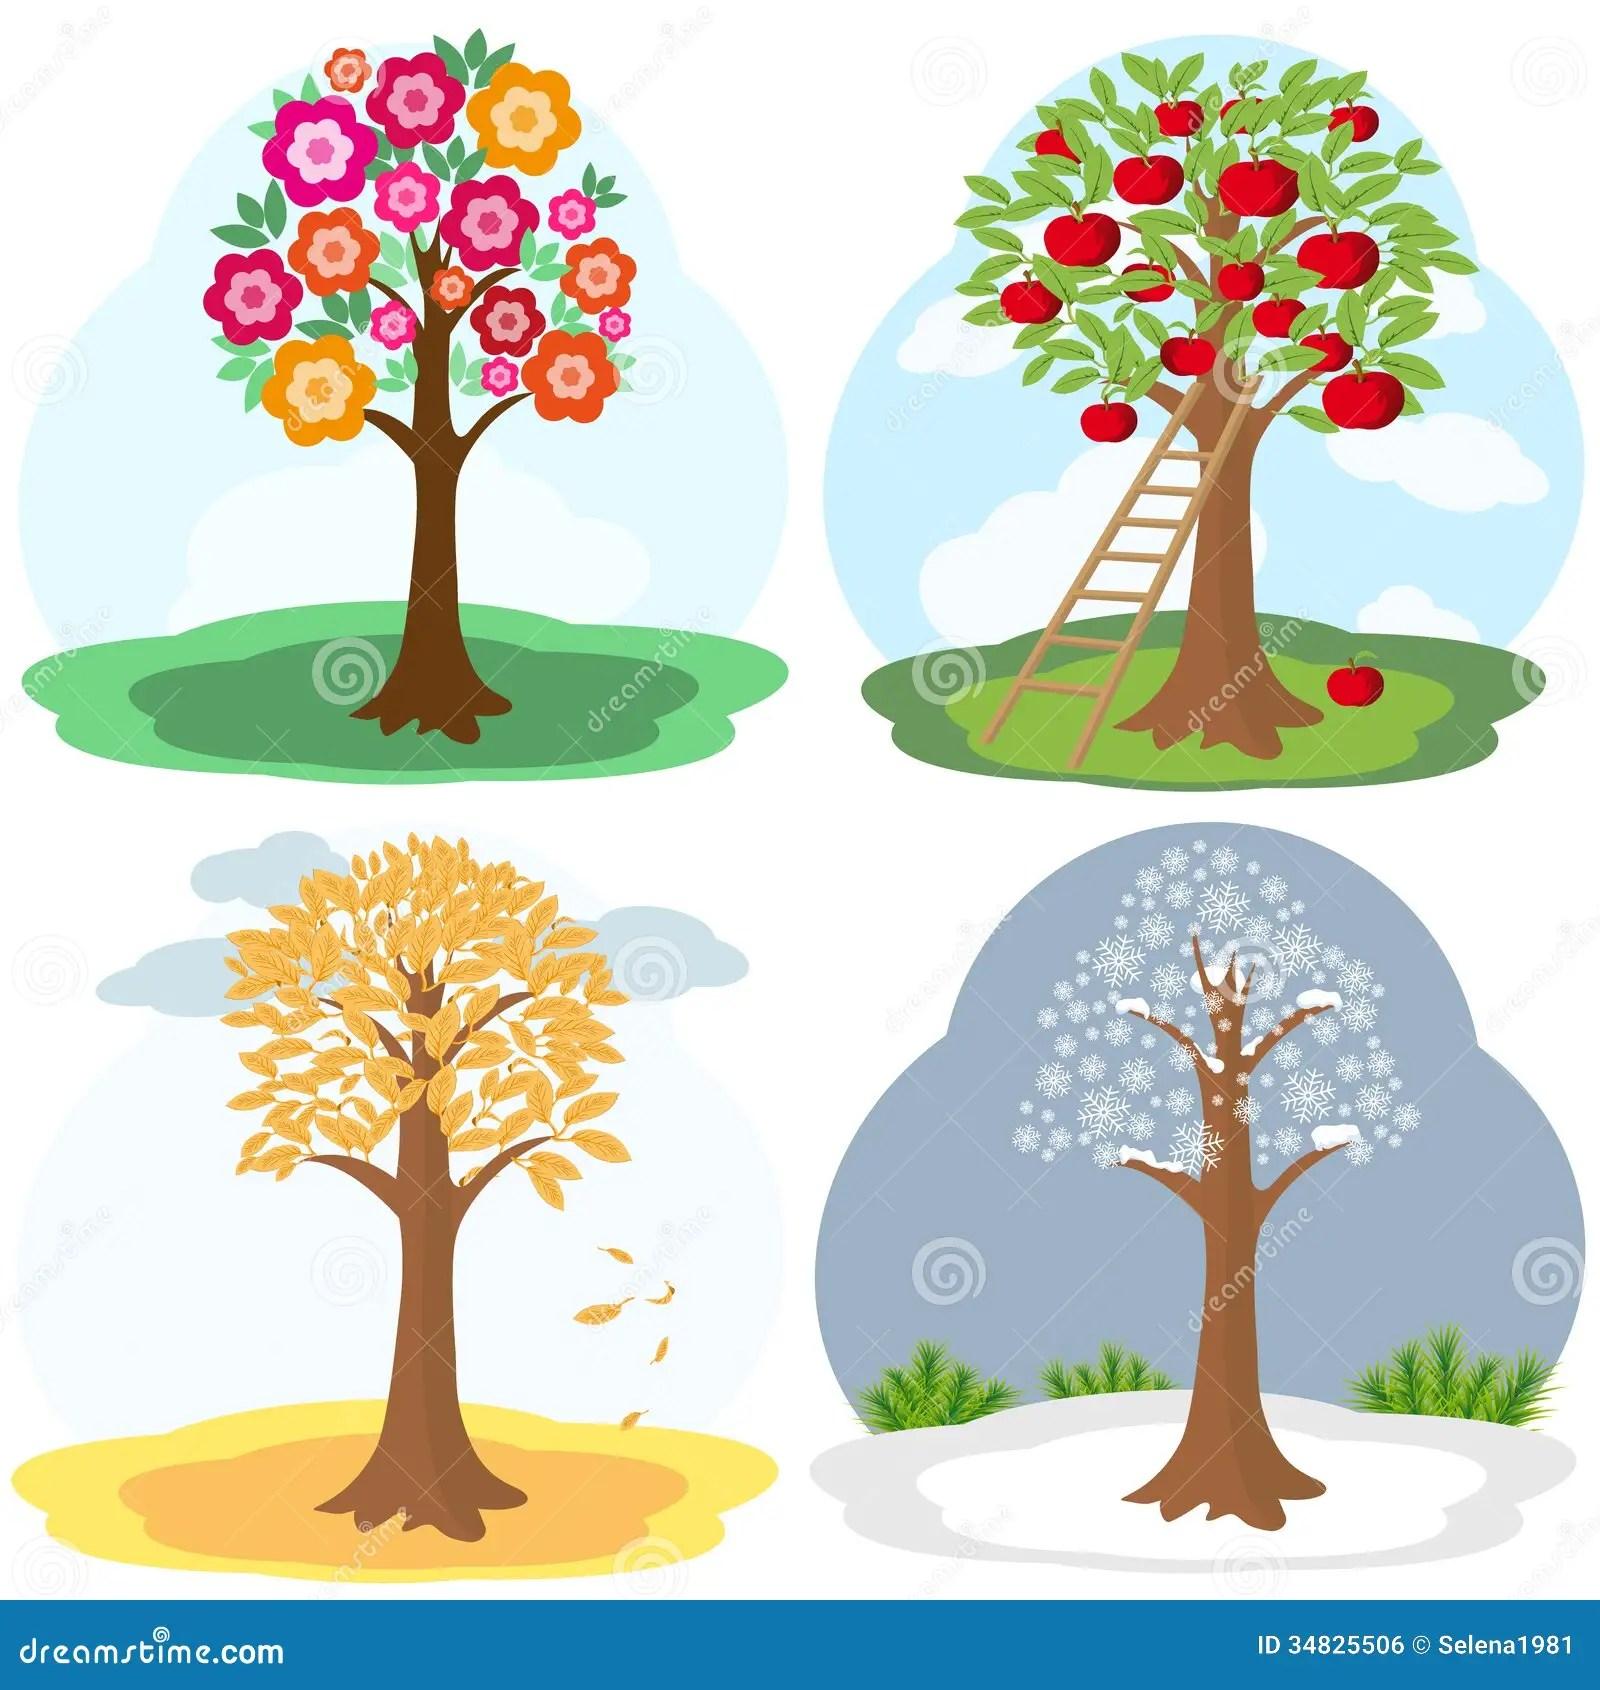 Tree Four Seasons Royalty Free Stock Image